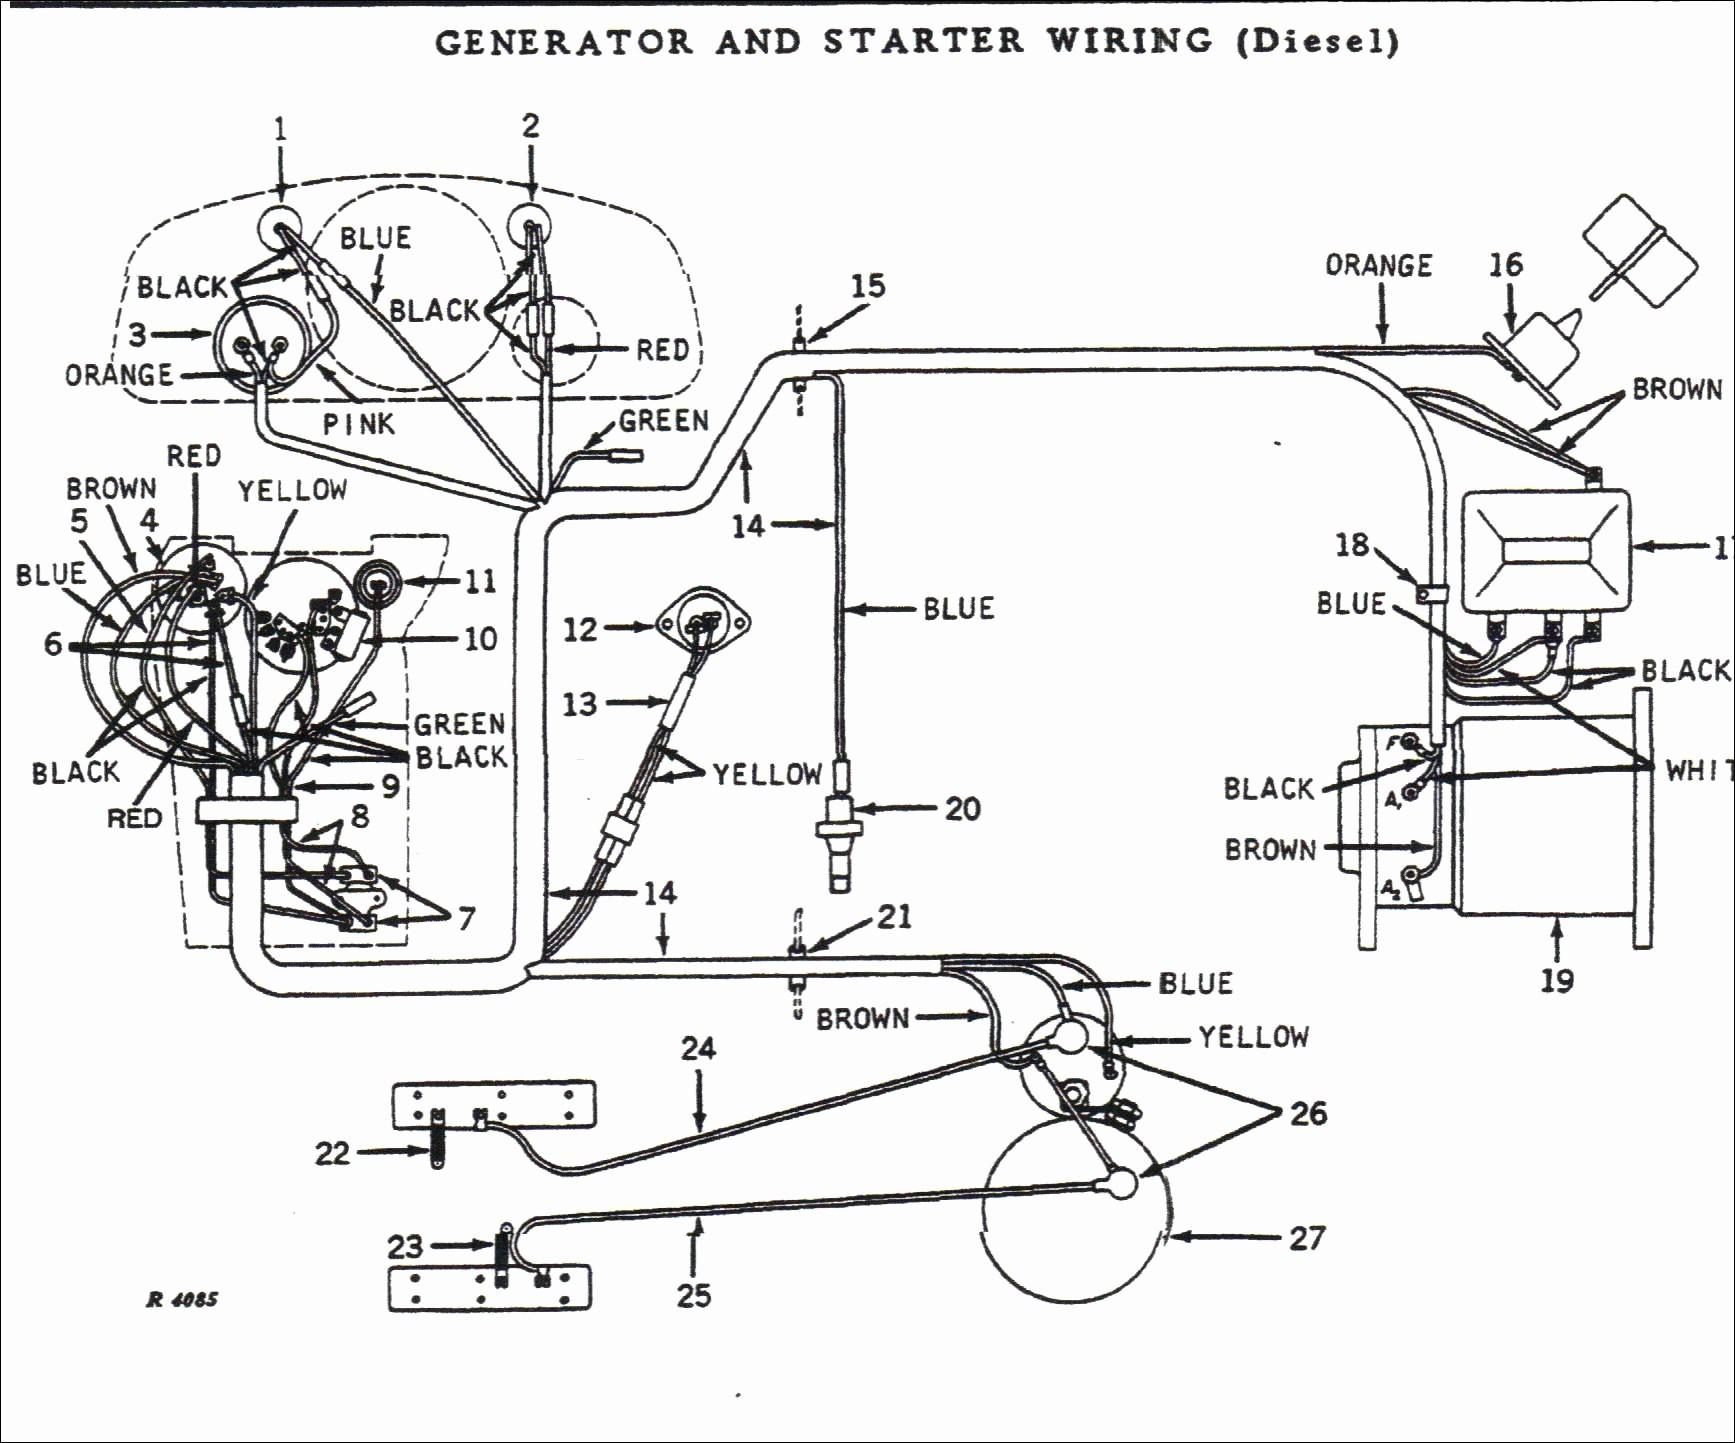 12 volt house wiring diagram